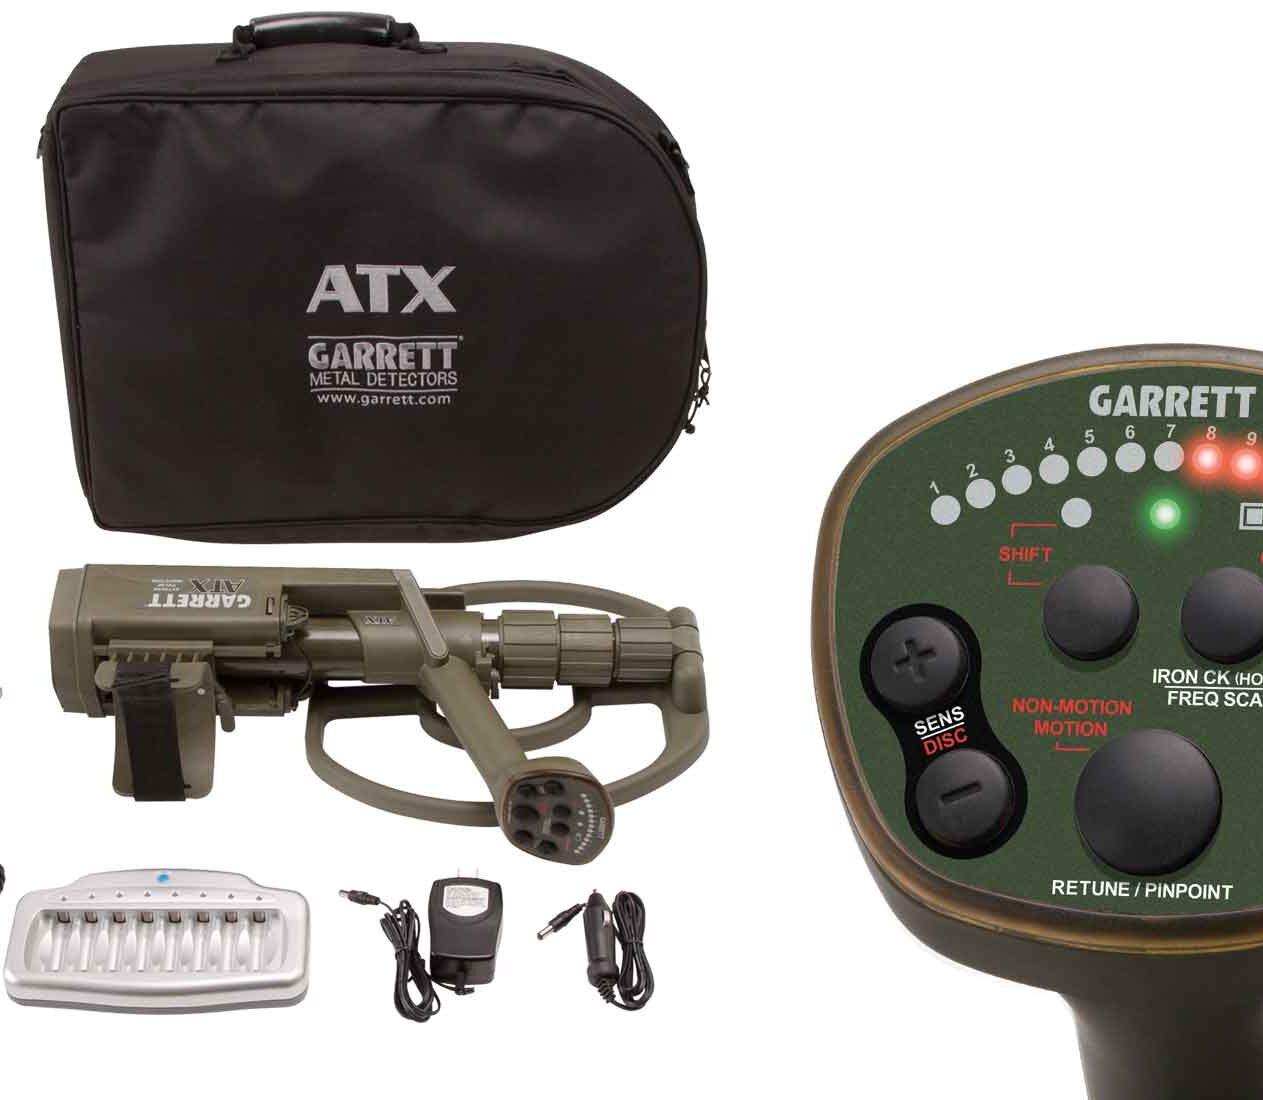 Metal DetectorATX Garrett regolabile con 25 settaggi